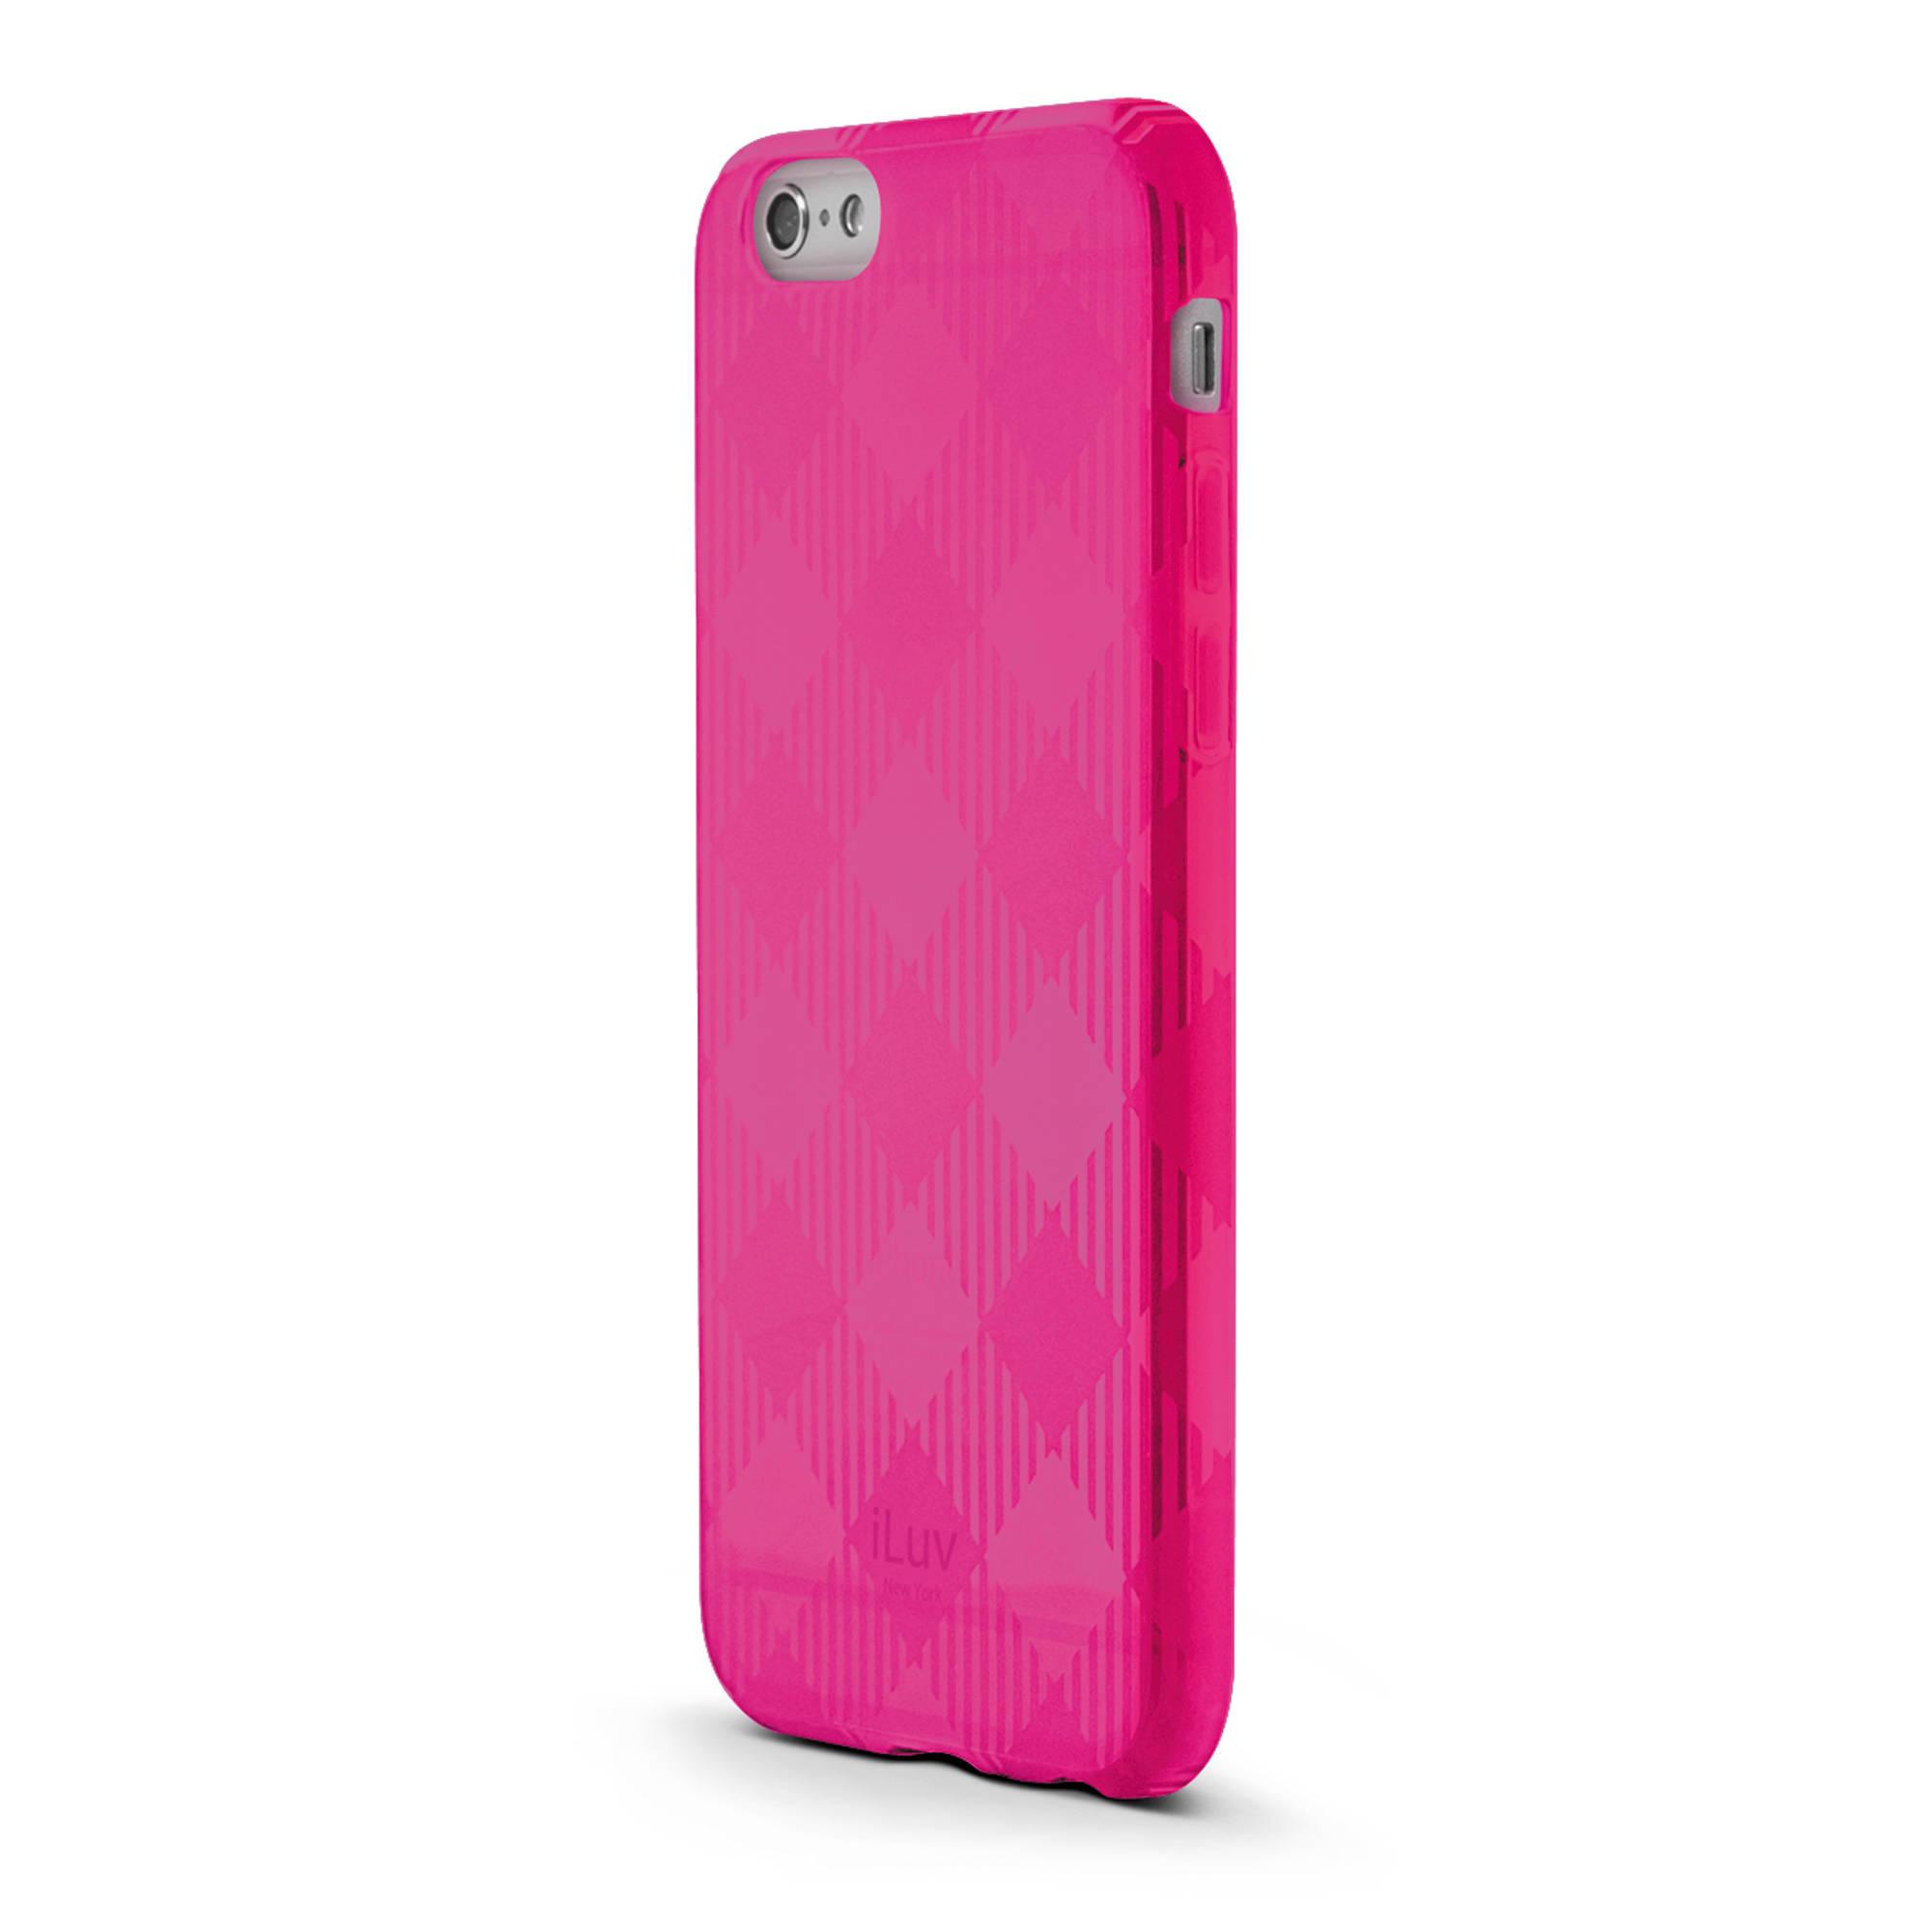 iluv gelato case for iphone 6 6s pink ai6gelapn b h photo. Black Bedroom Furniture Sets. Home Design Ideas